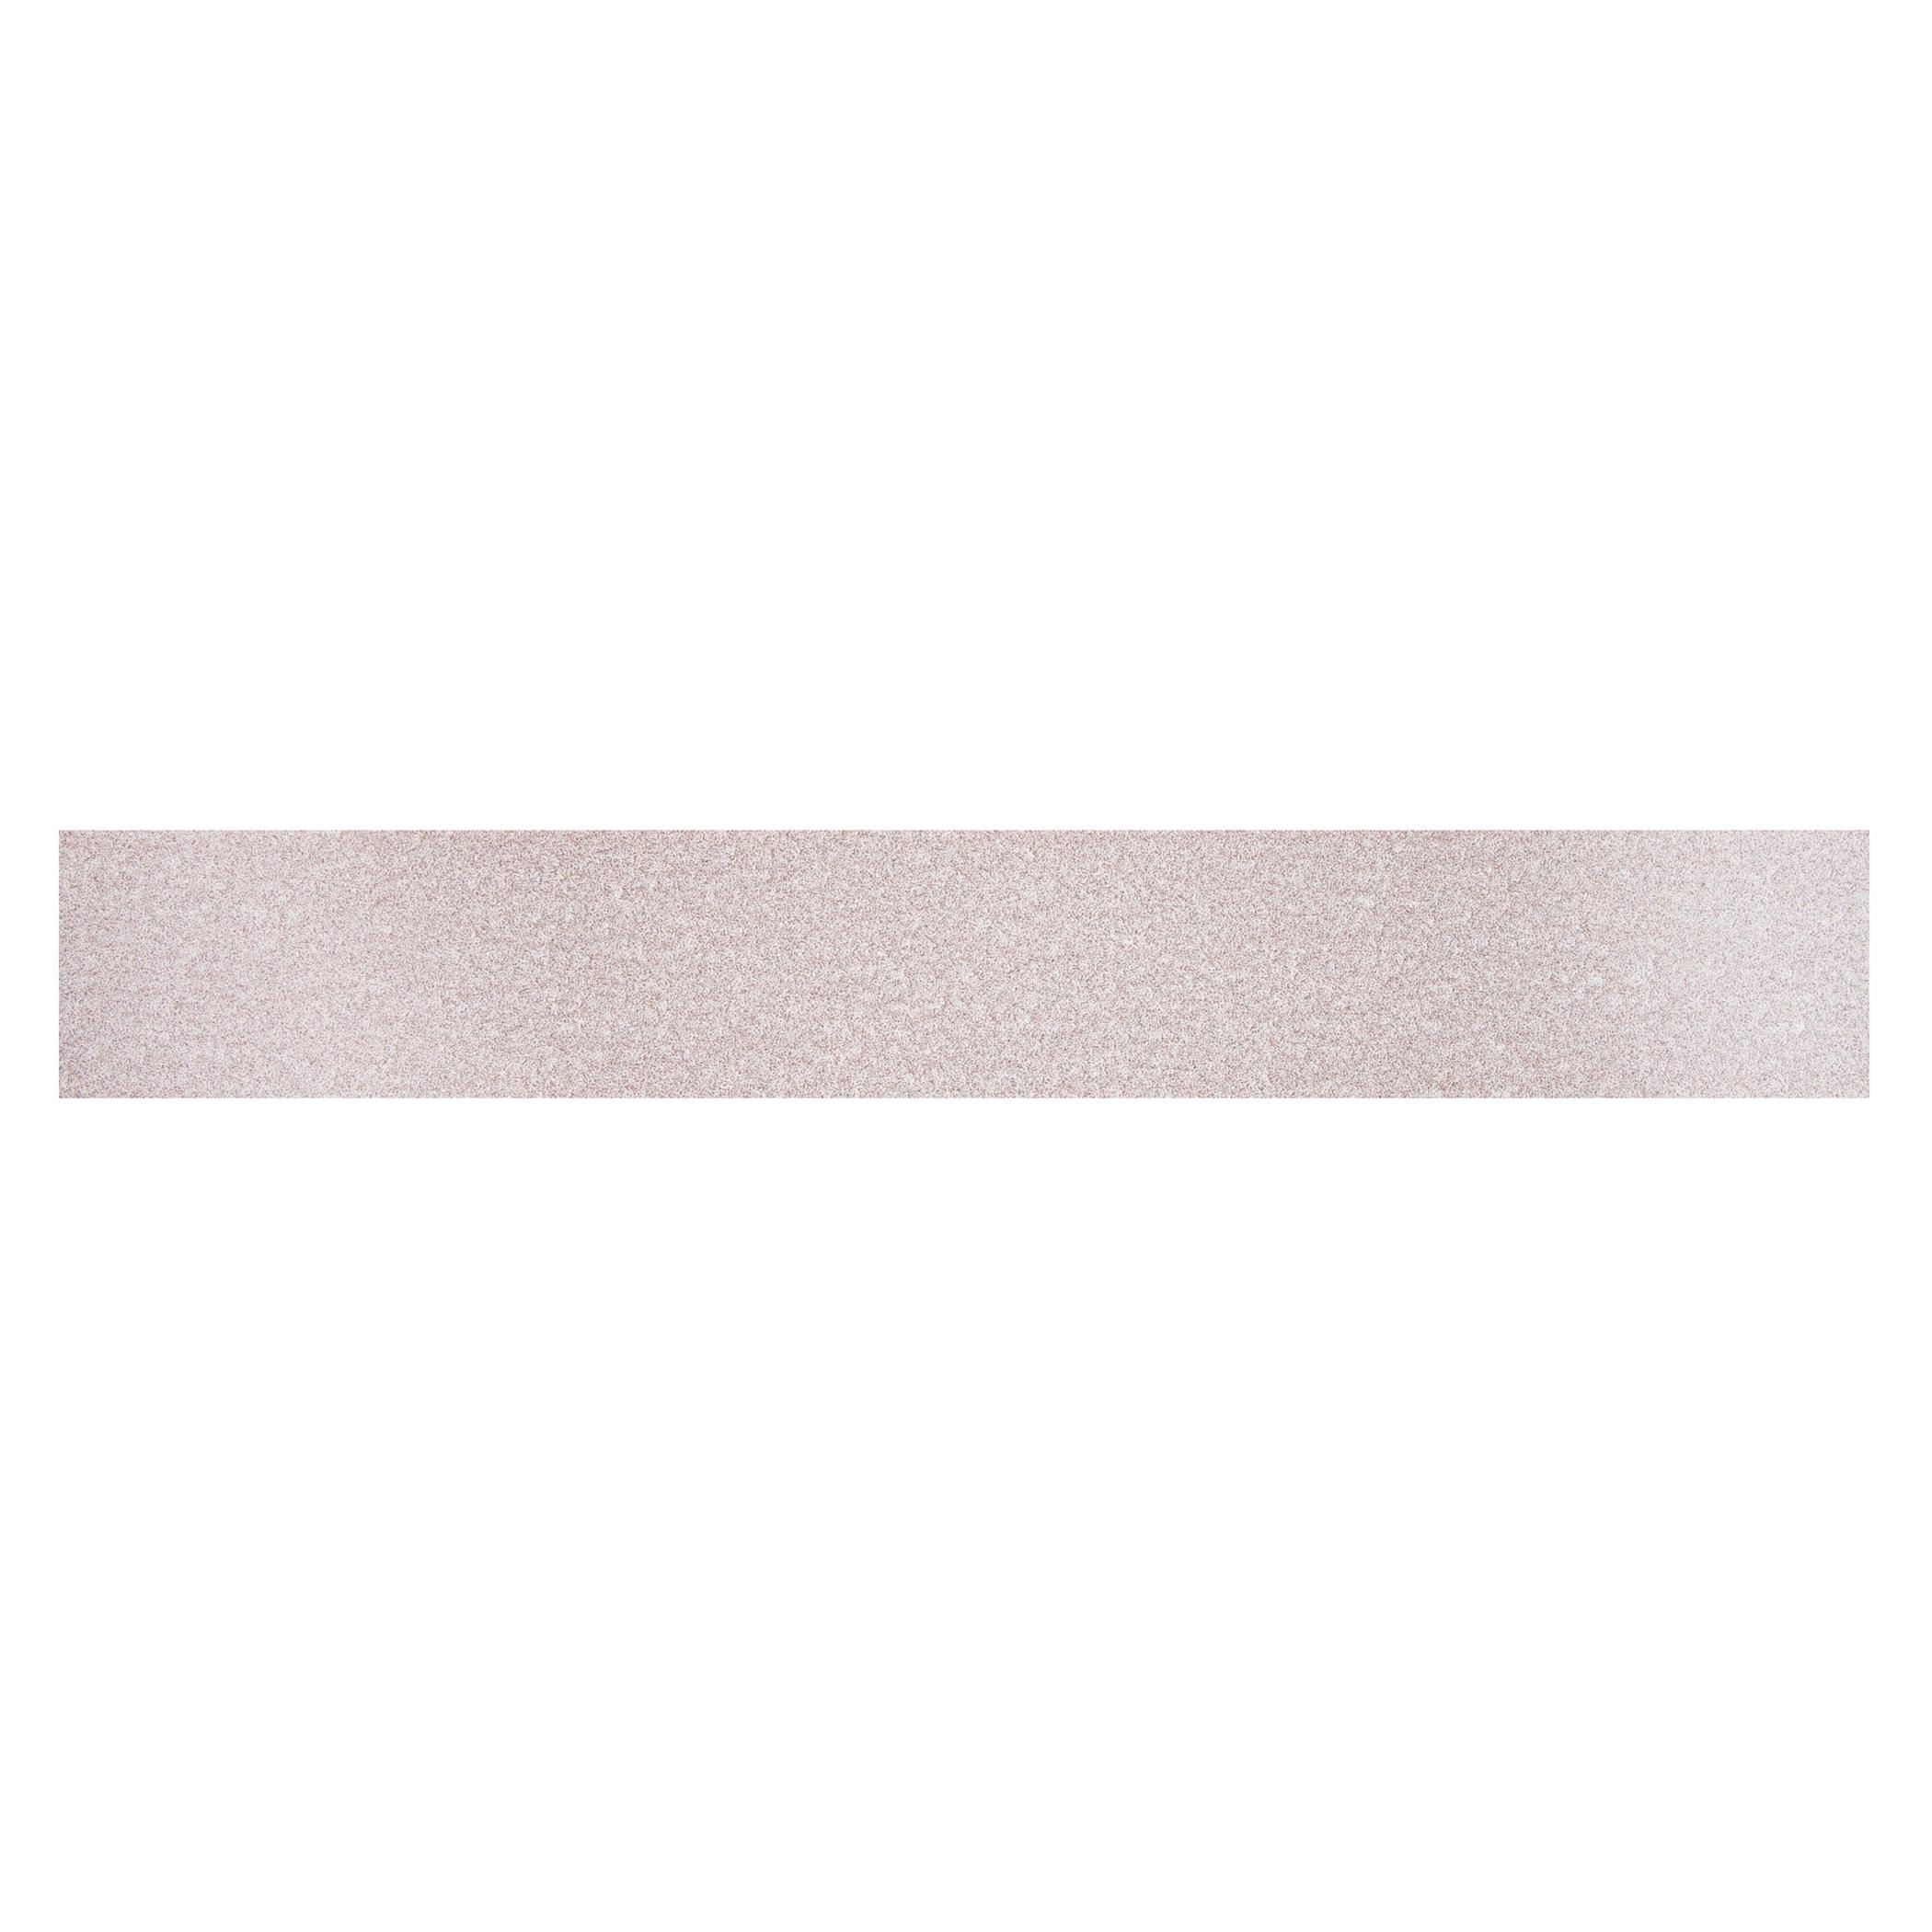 Norton® 66261131648 A275OP Non-PSA Coated File Strip, 17-1/2 in L x 2-3/4 in W, P180 Grit, Fine Grade, Aluminum Oxide Abrasive, Anti-Loading Paper Backing